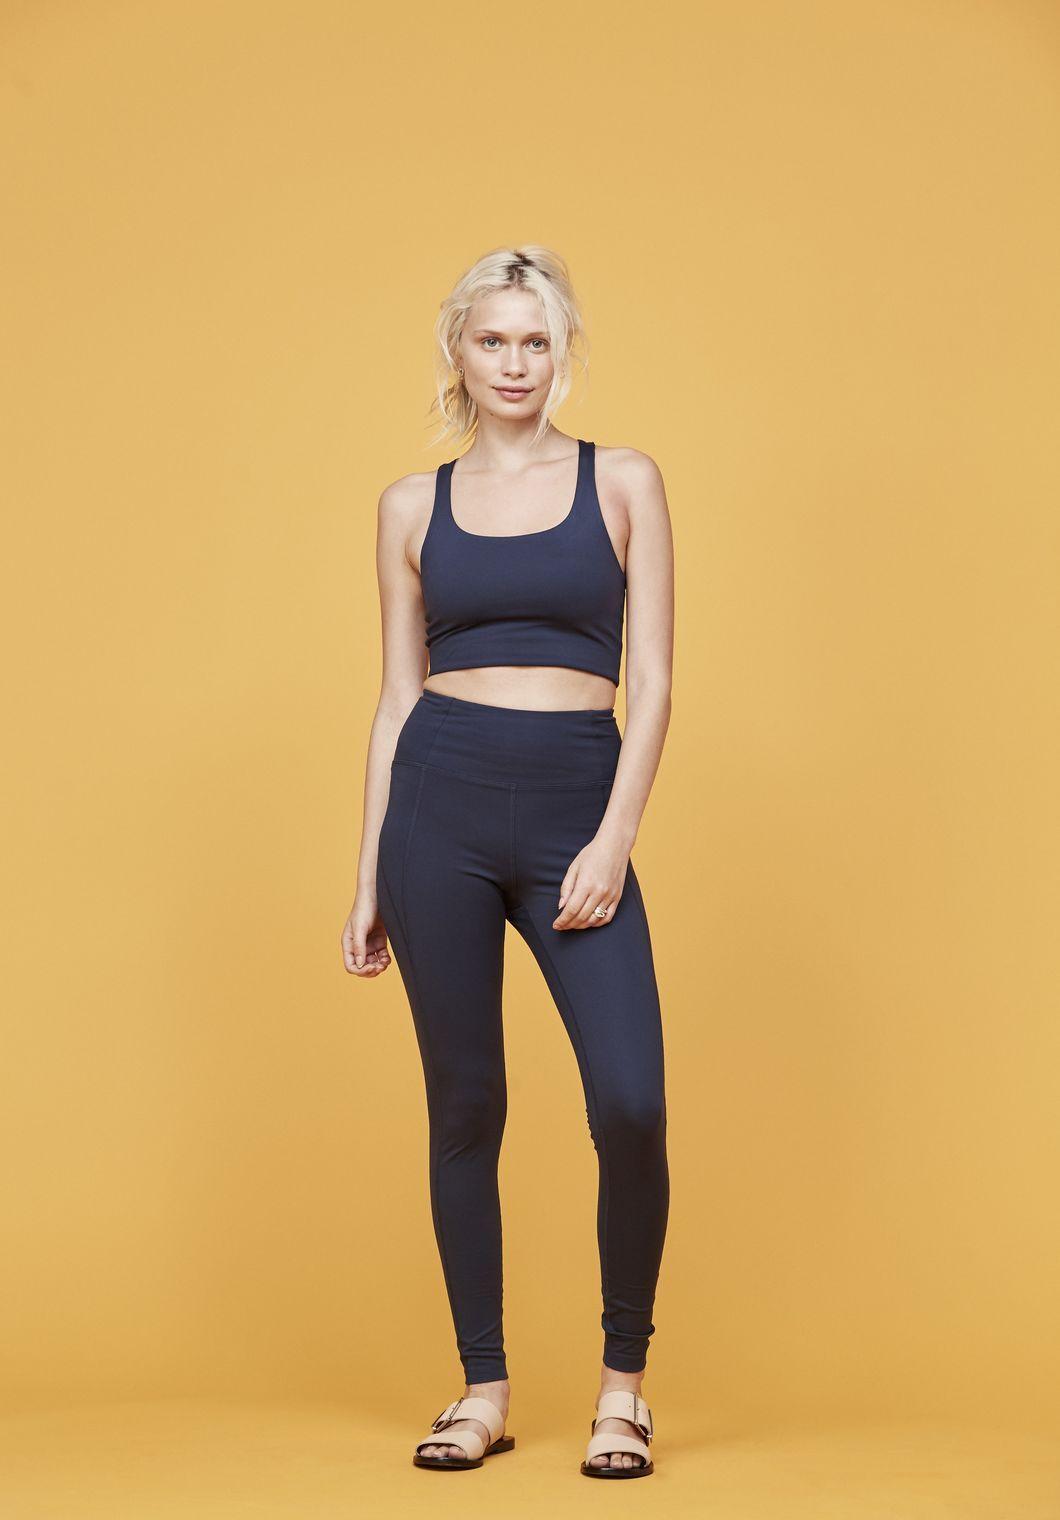 fe0a02c931 Midnight Compressive High-Rise Legging - 28.5 | Clothing | Black ...